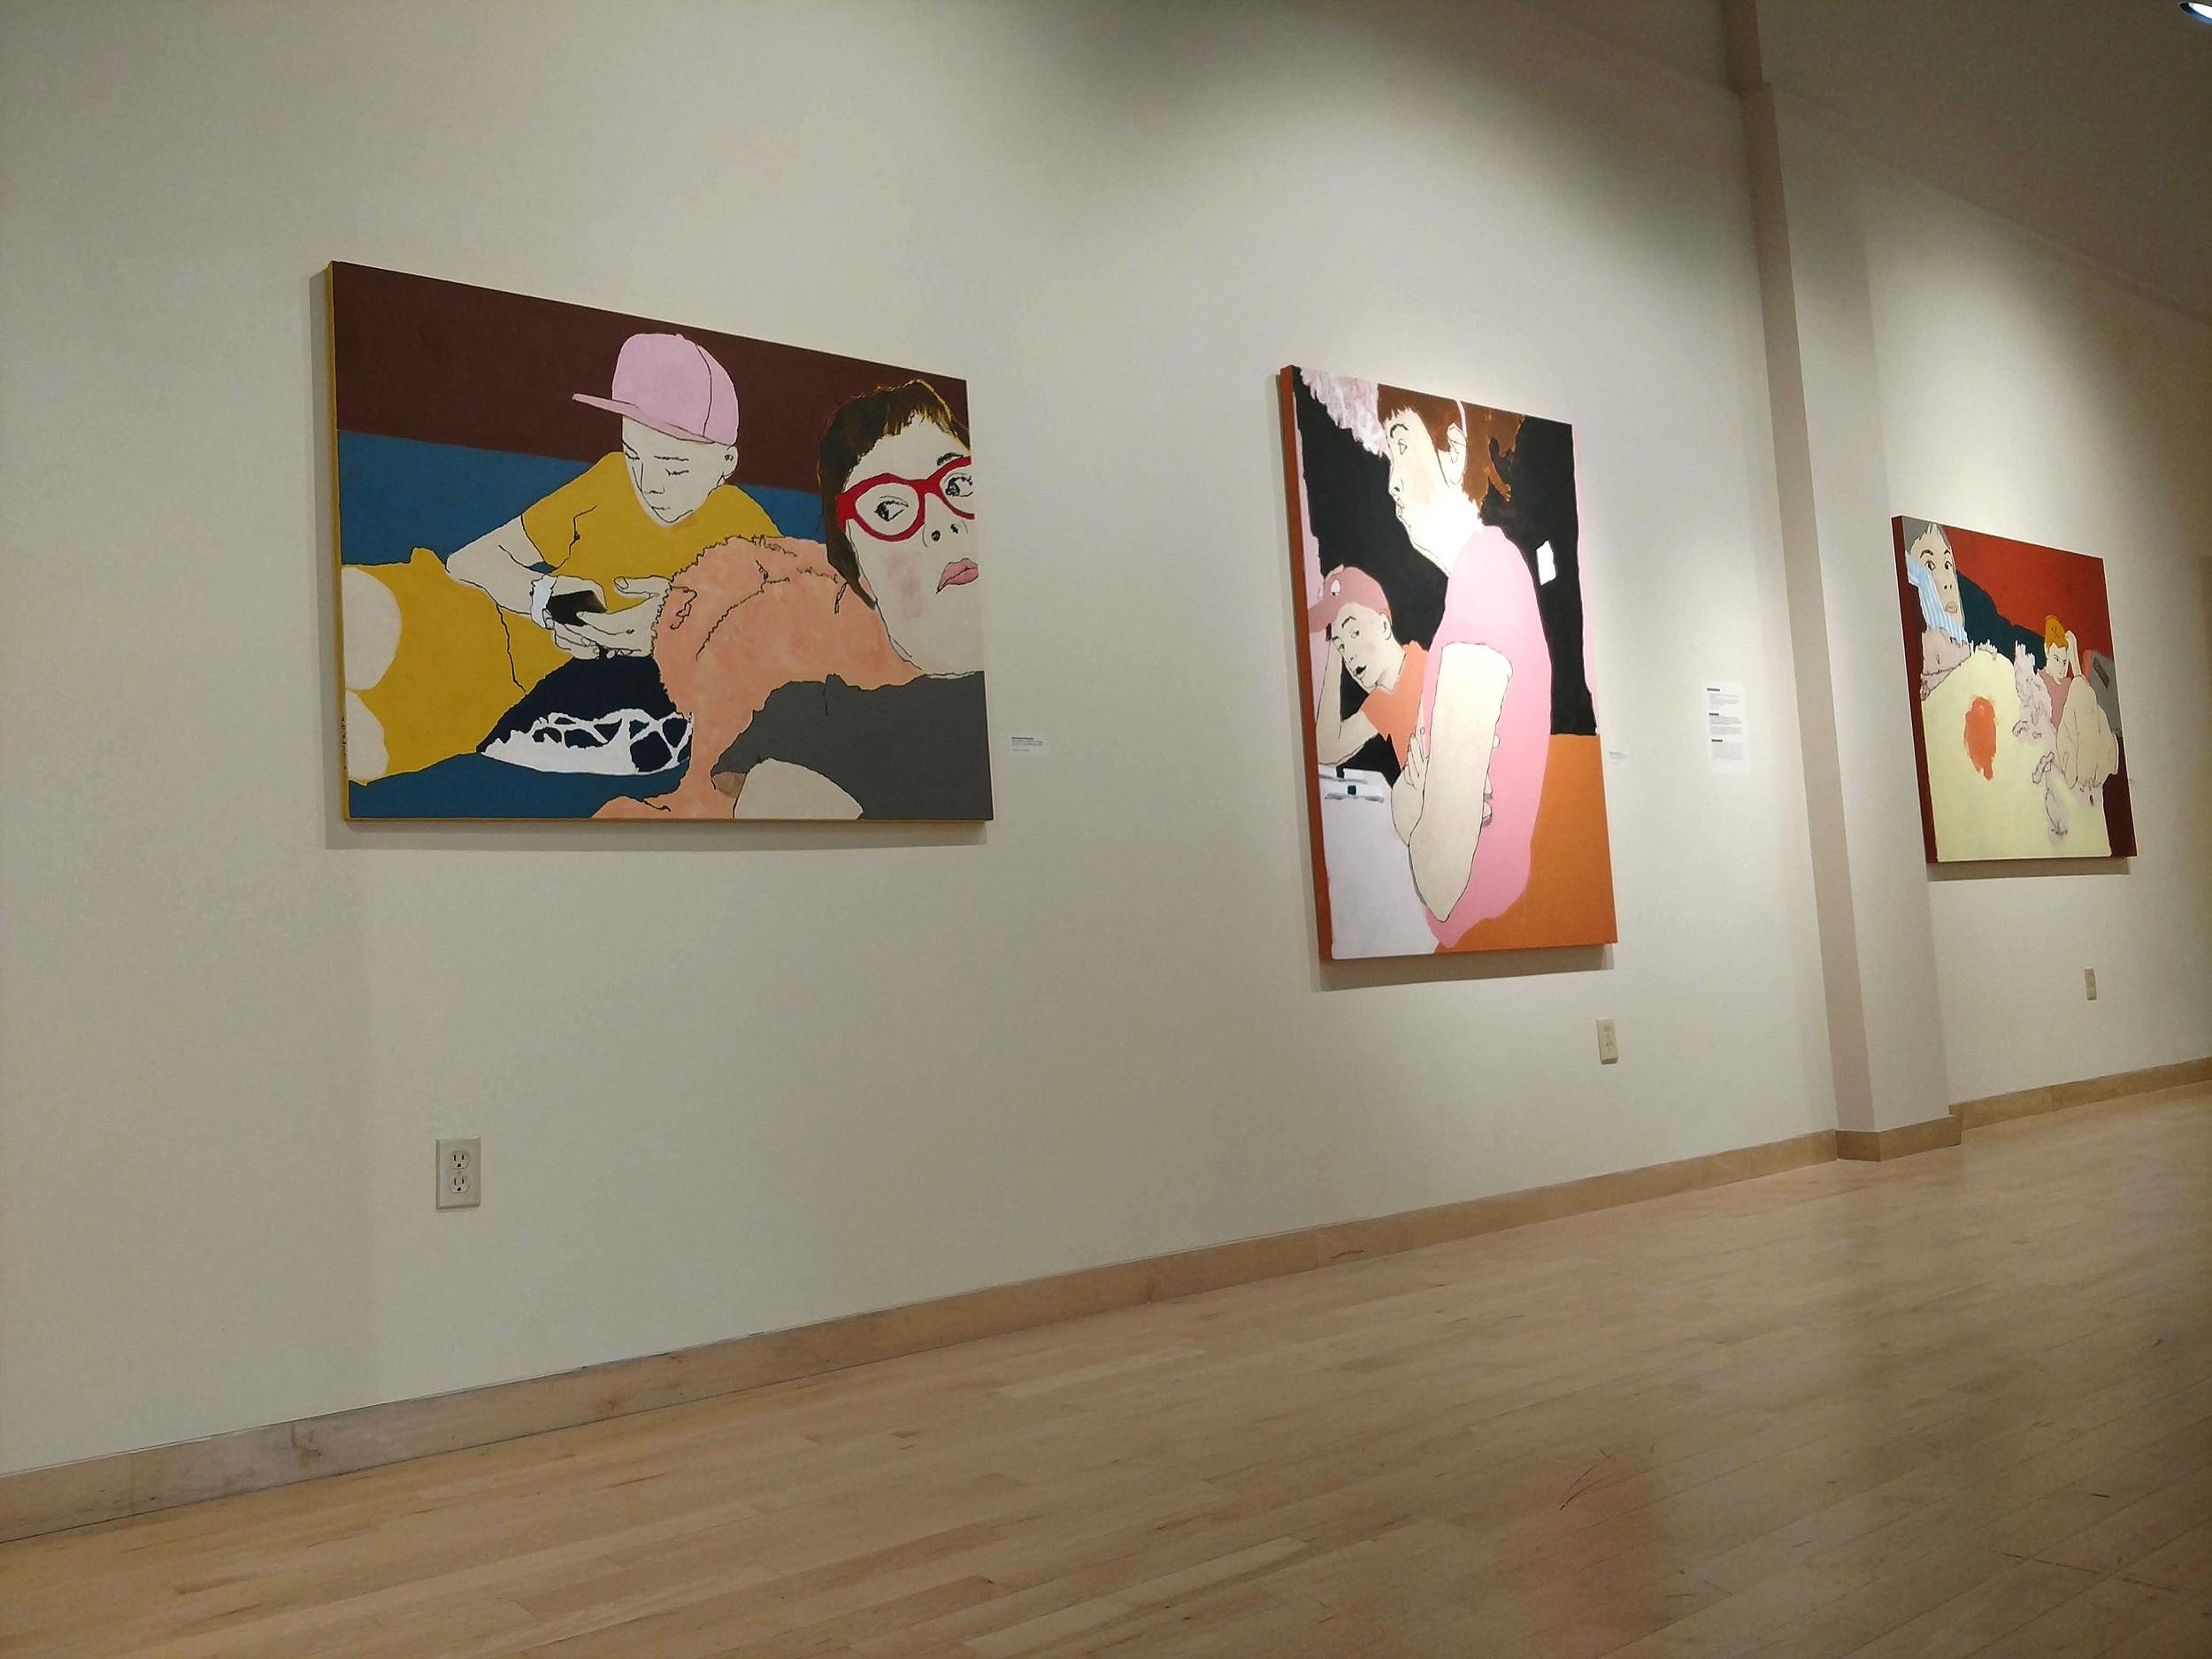 Installation view of Body Language at Krasl Art Center, Saint Joseph, MI